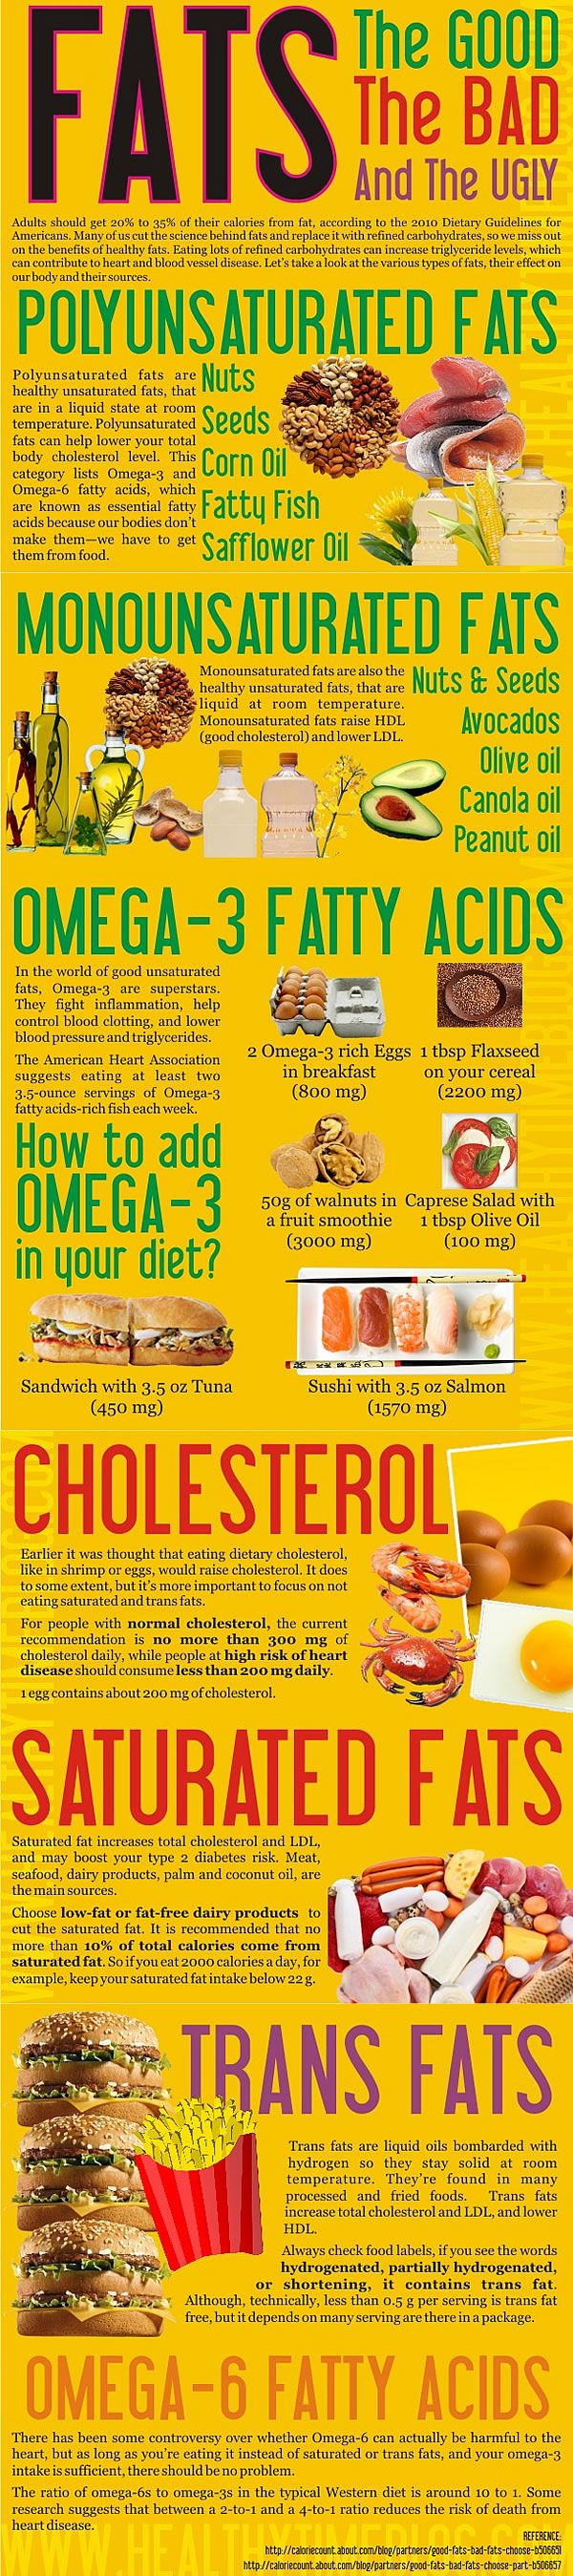 Health Infographic #Health #Infographic